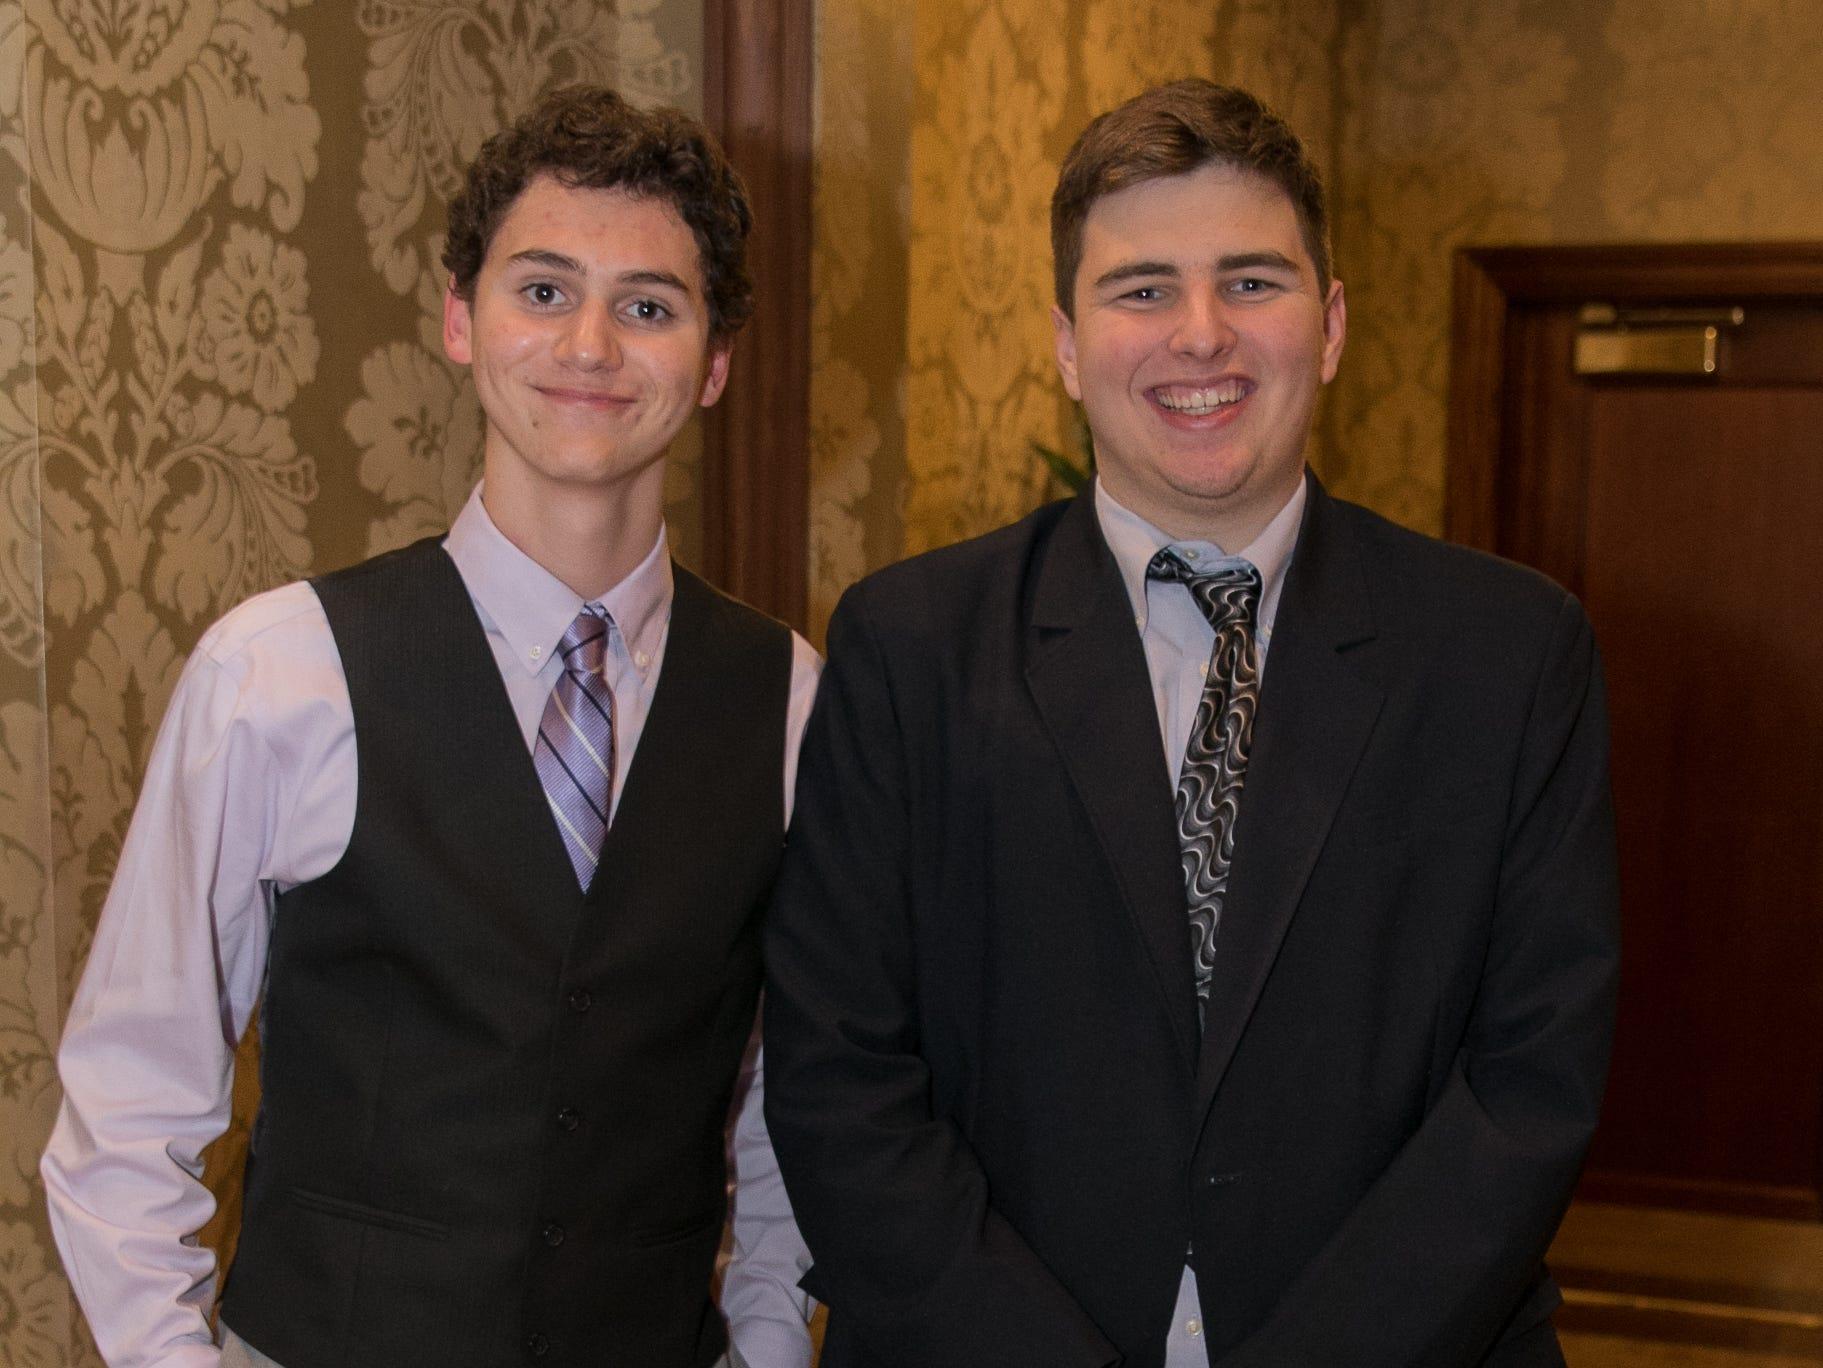 Sebastian Fox, Curtis Bommer. Don Bosco Prep held it's 17th Annual President's Gala at The Venitian in Garfield, NJ. 10/25/2018